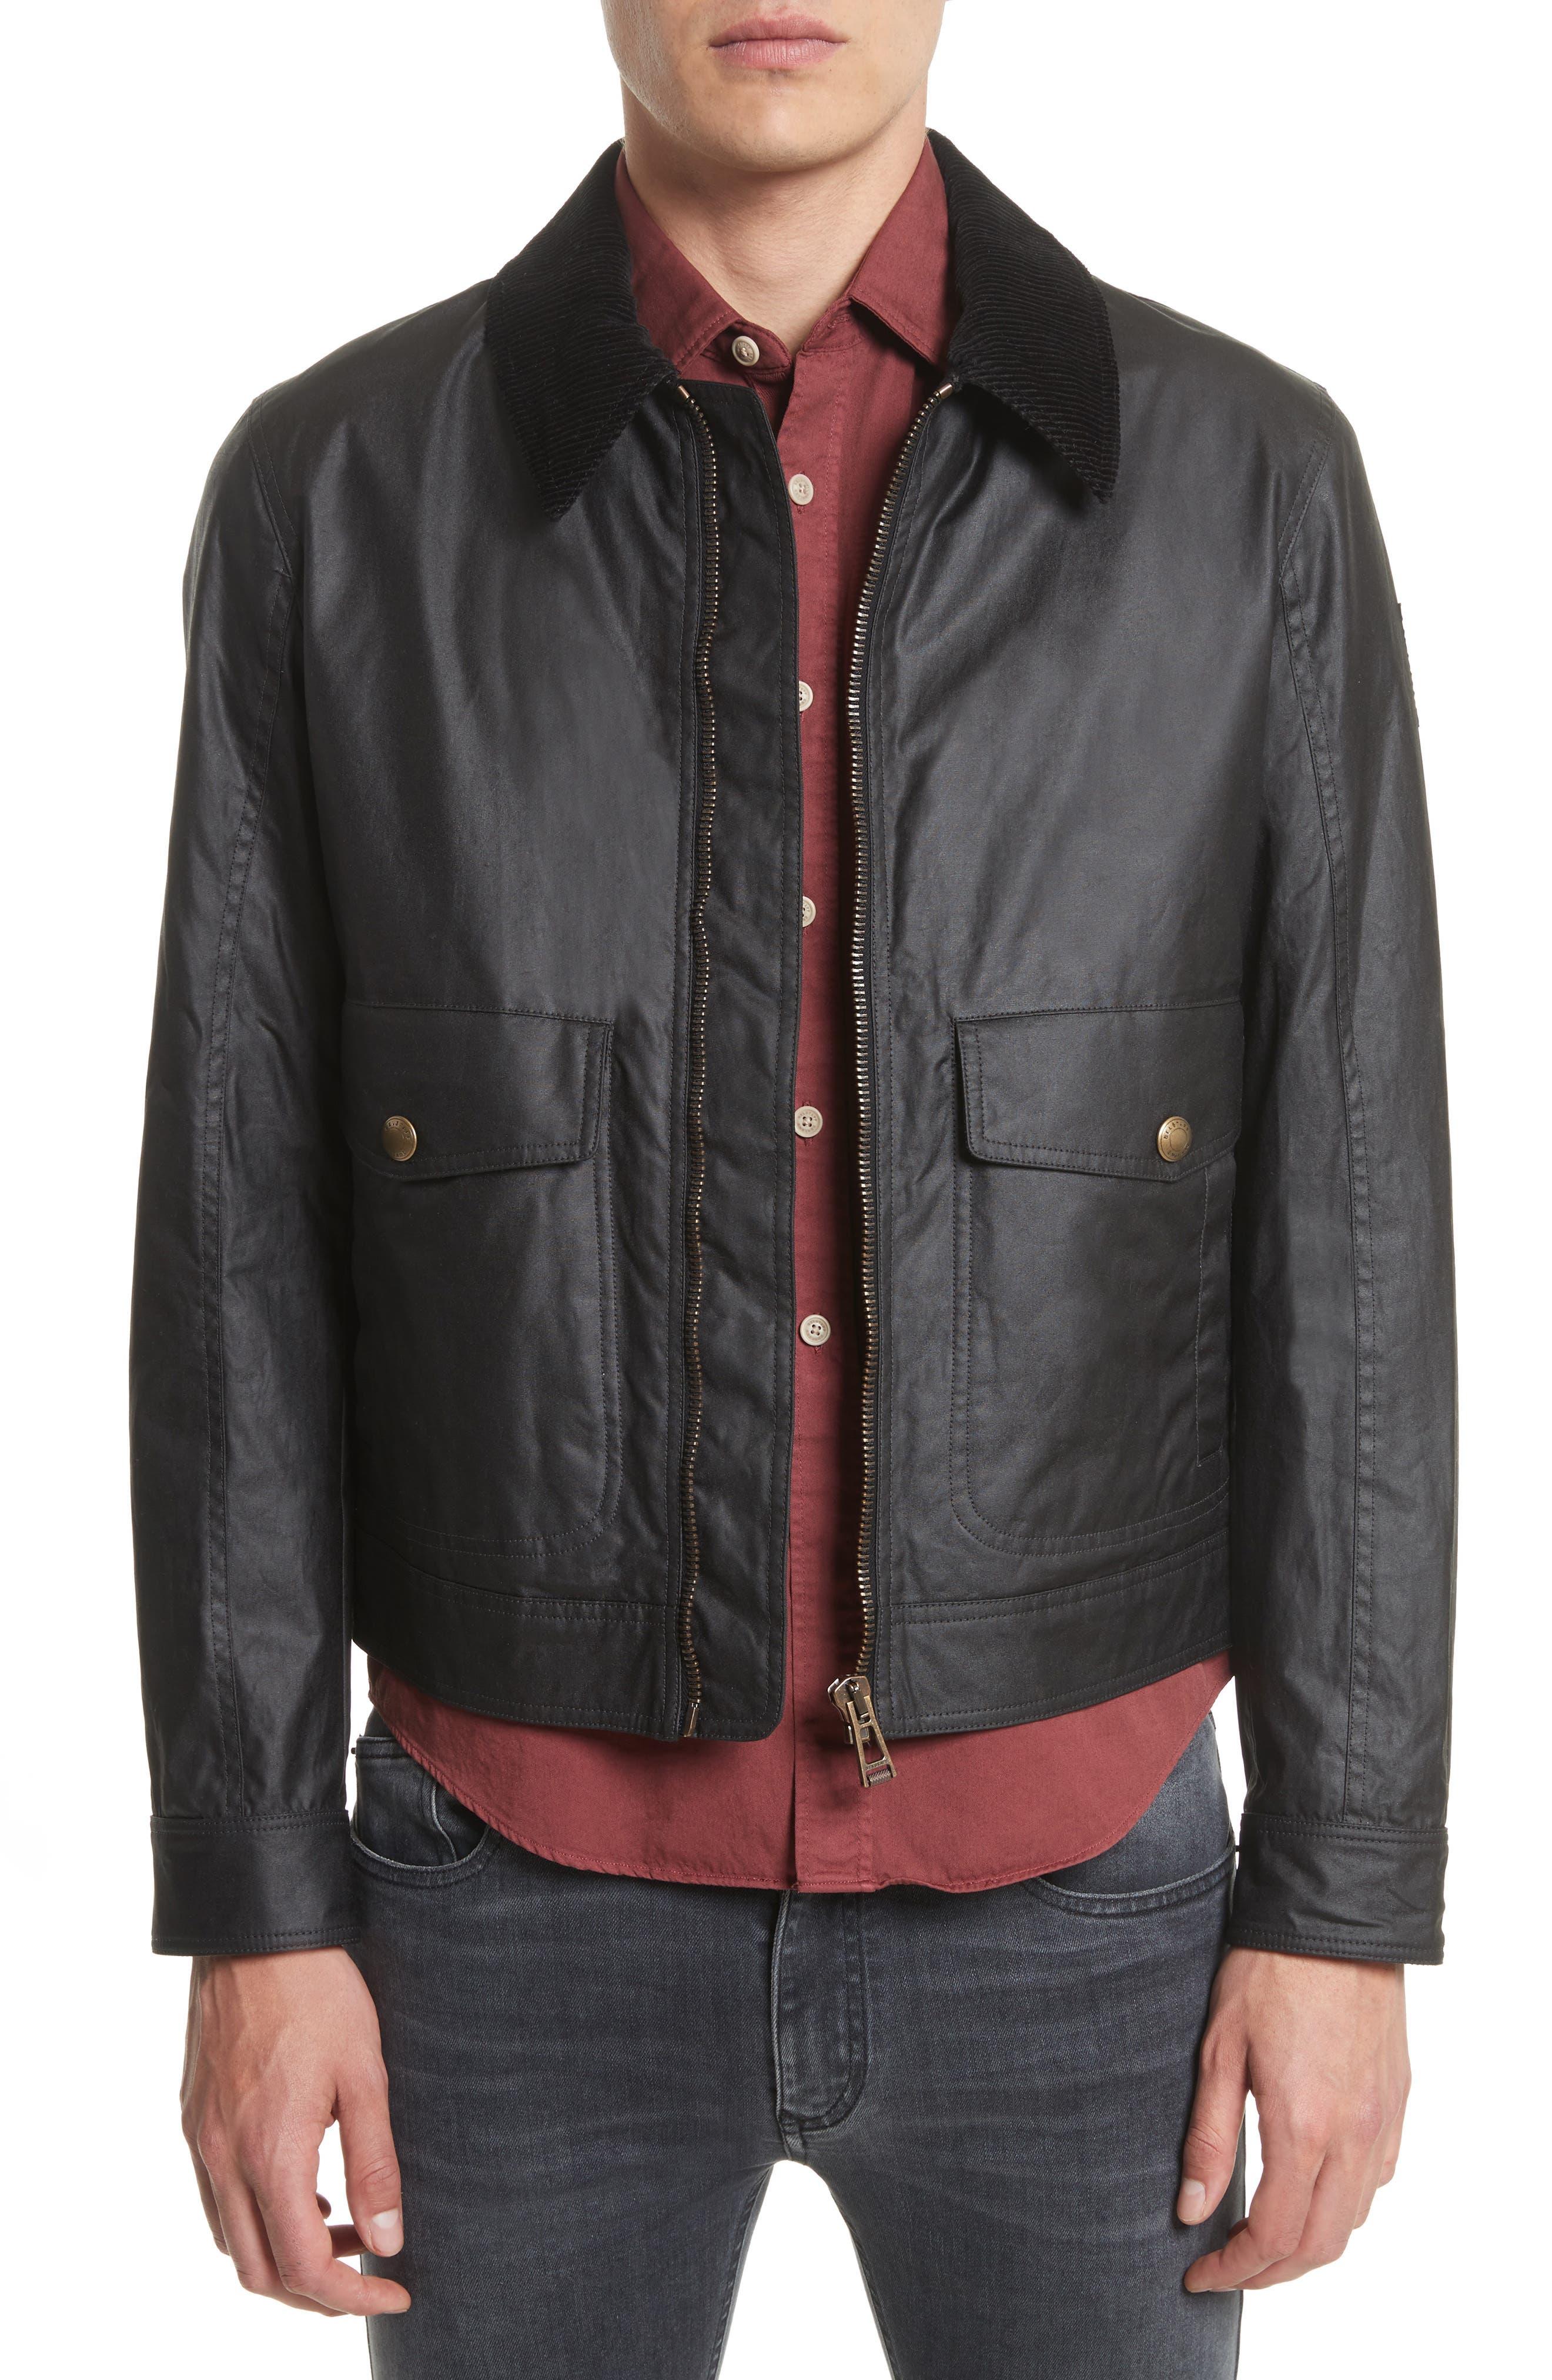 Belstaff Mentmore Waxed Cotton Jacket